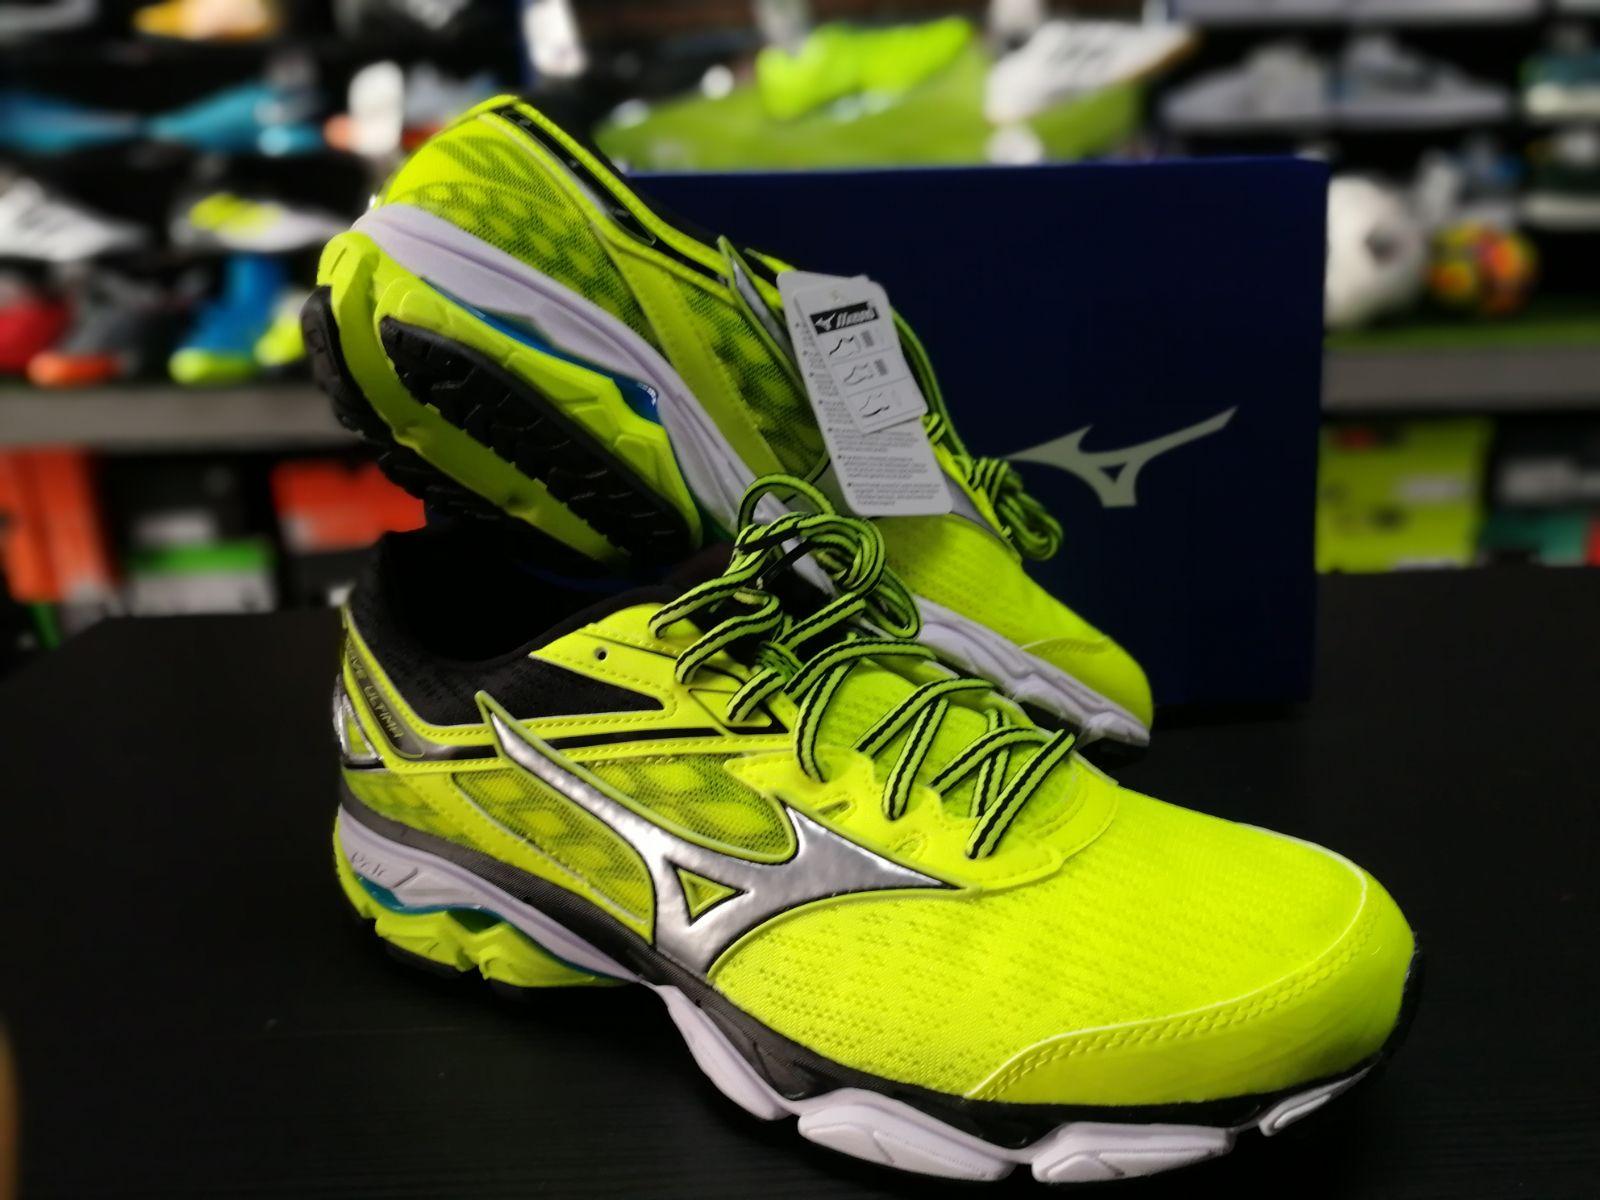 c370236943897 Mizuno Wave Ultima 9 Chaussures de course Sneakers Running Shoes ...